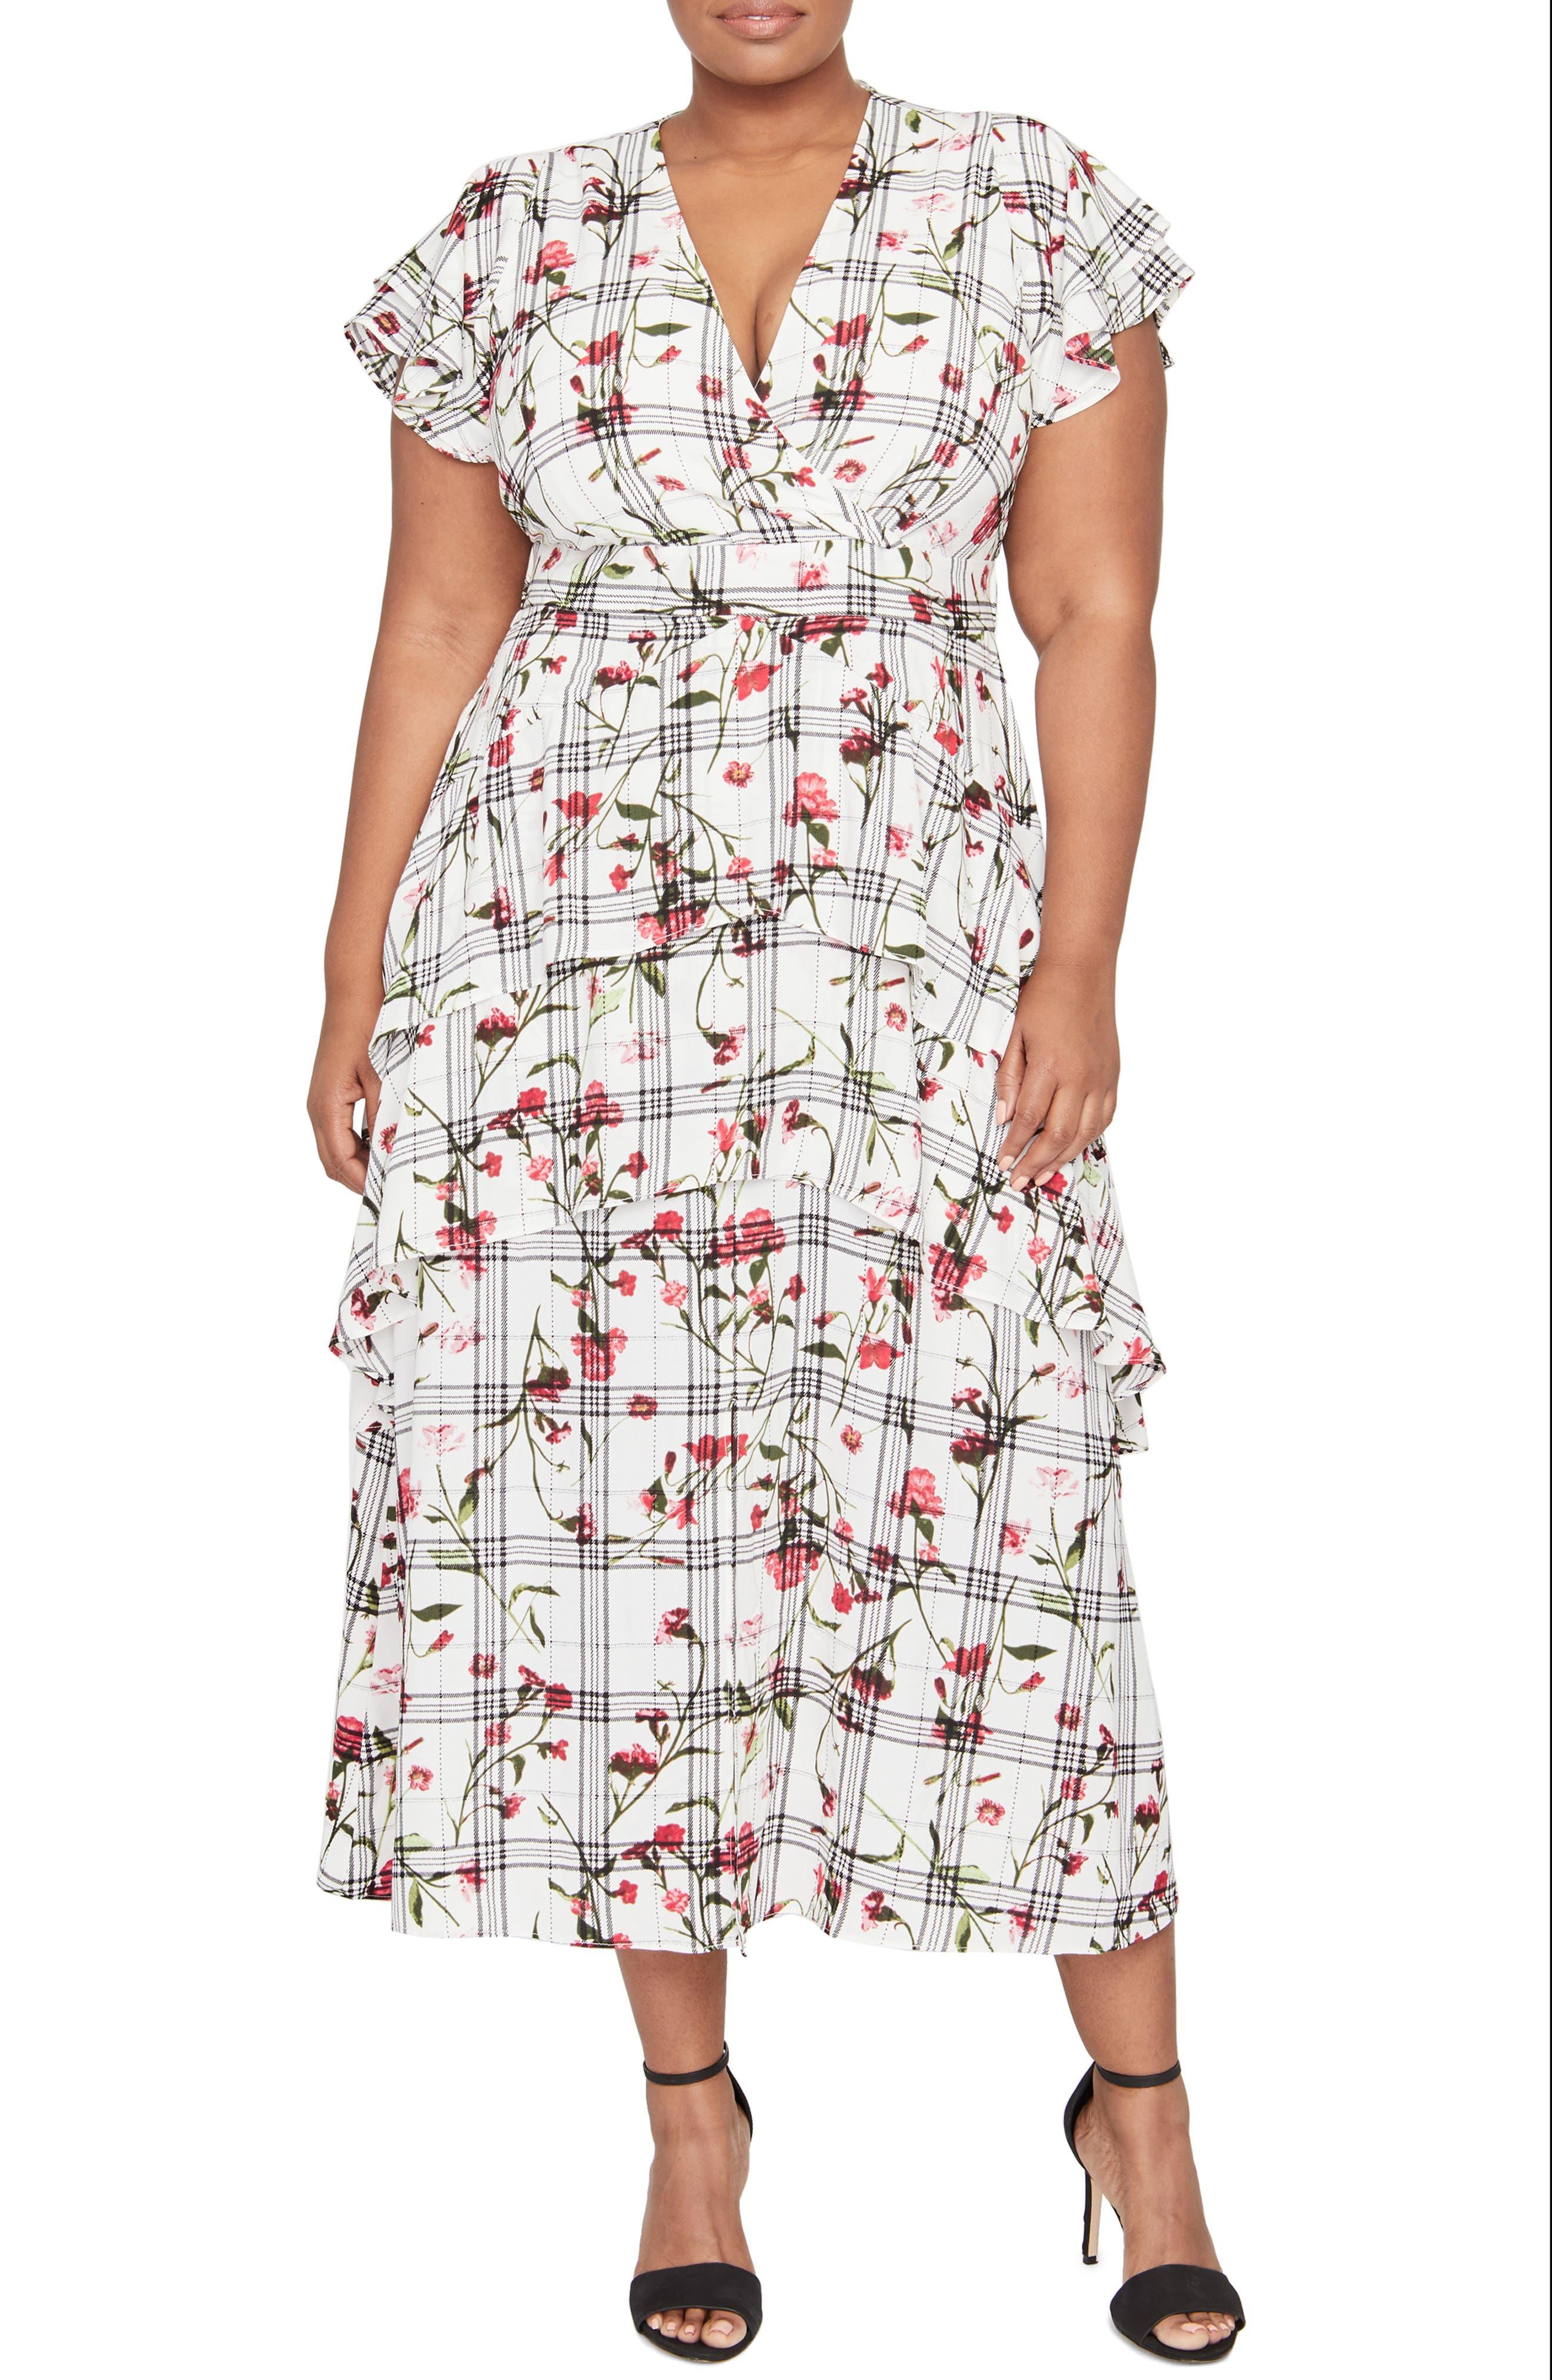 Plus Size Rachel Roy Lucia Flutter Sleeve Dress, Ivory